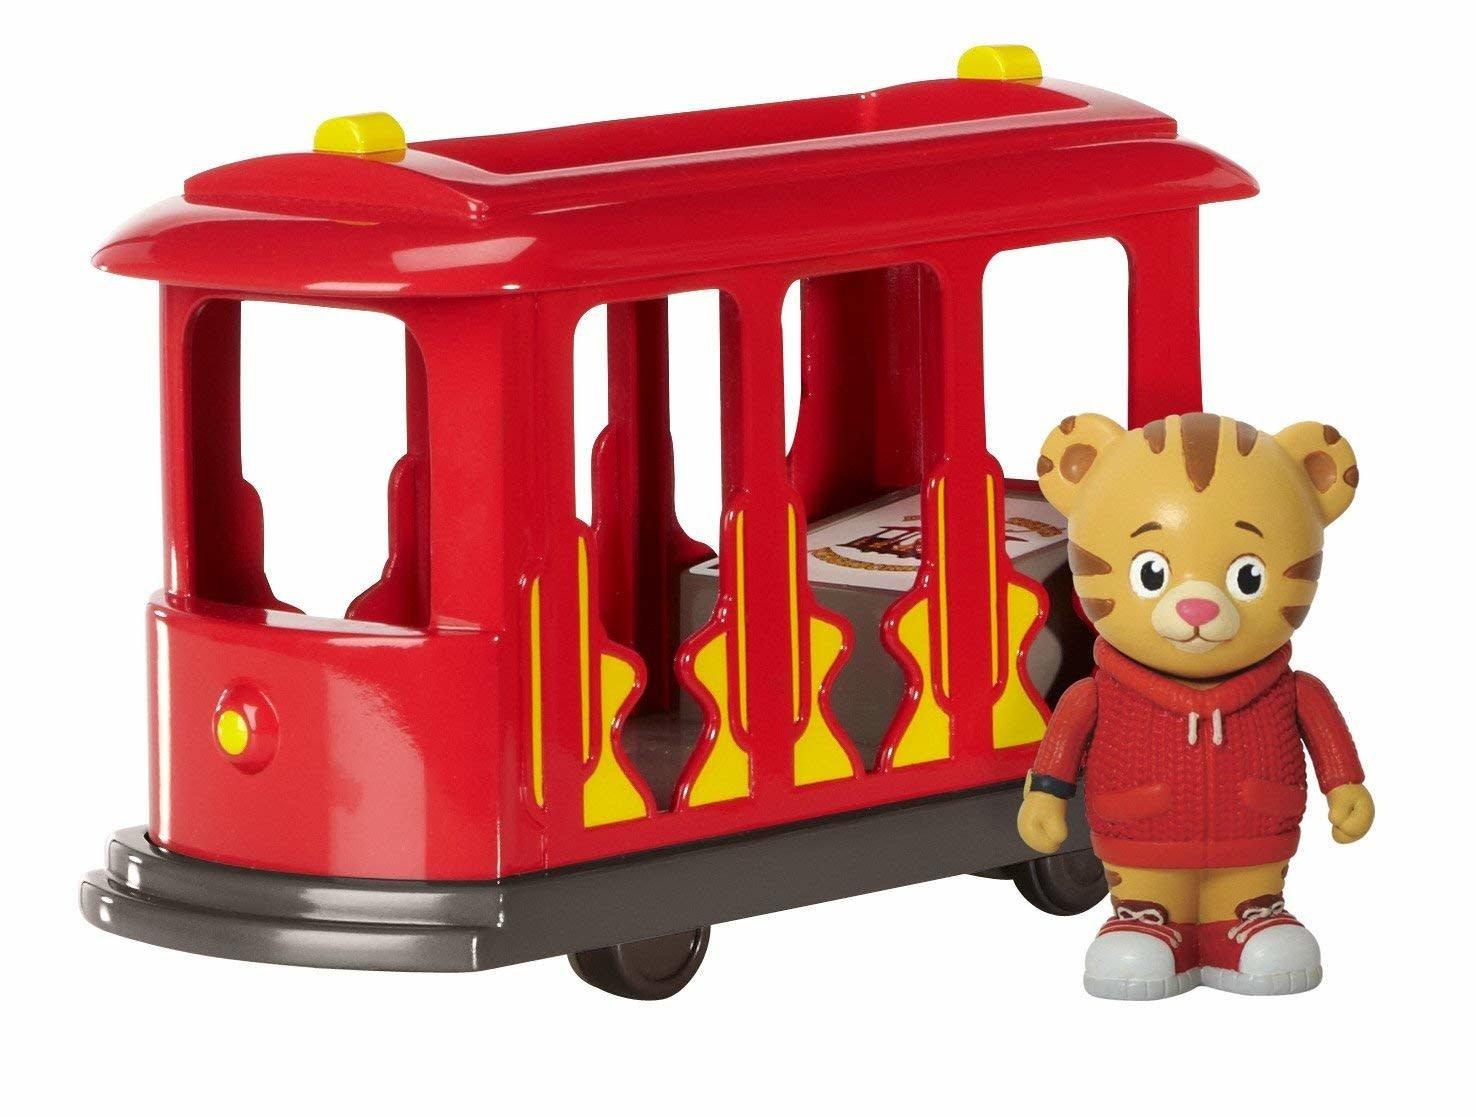 Daniel Tiger's Neighborhood Trolley w/ Daniel Tiger Figure